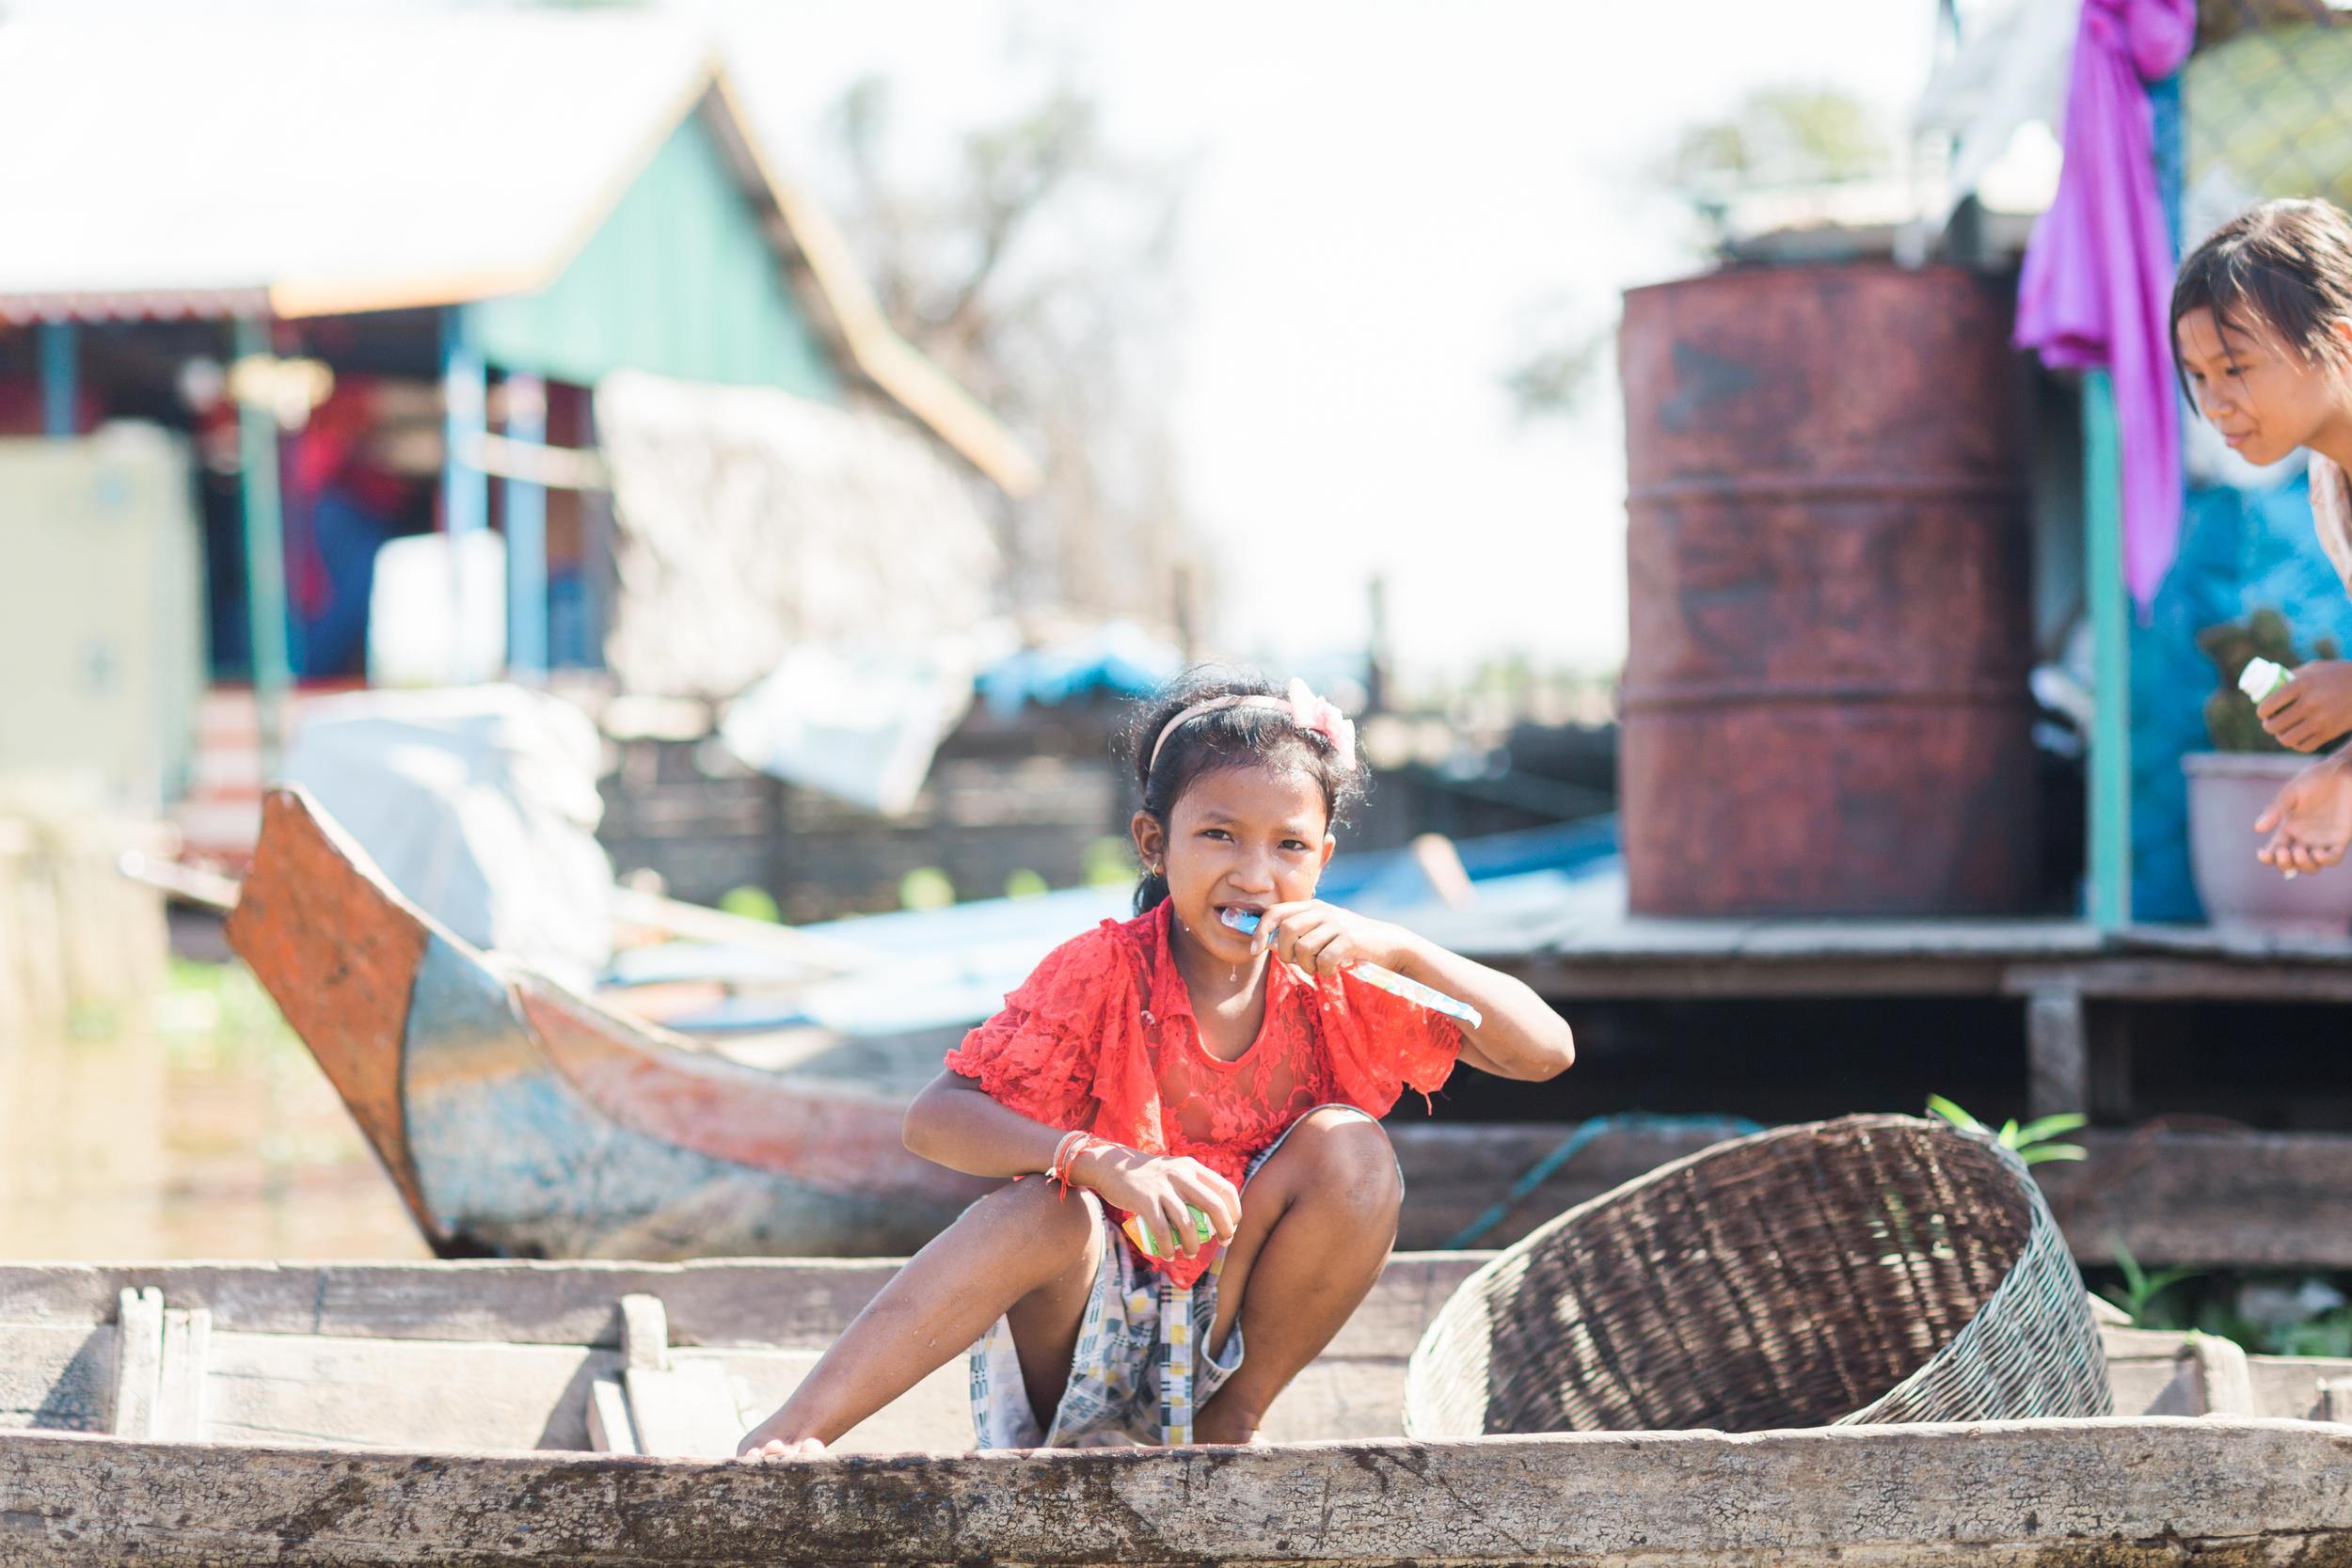 Cari Zhu Photography - Cambodia Siem Reap South East Asia Travel-1737.jpg